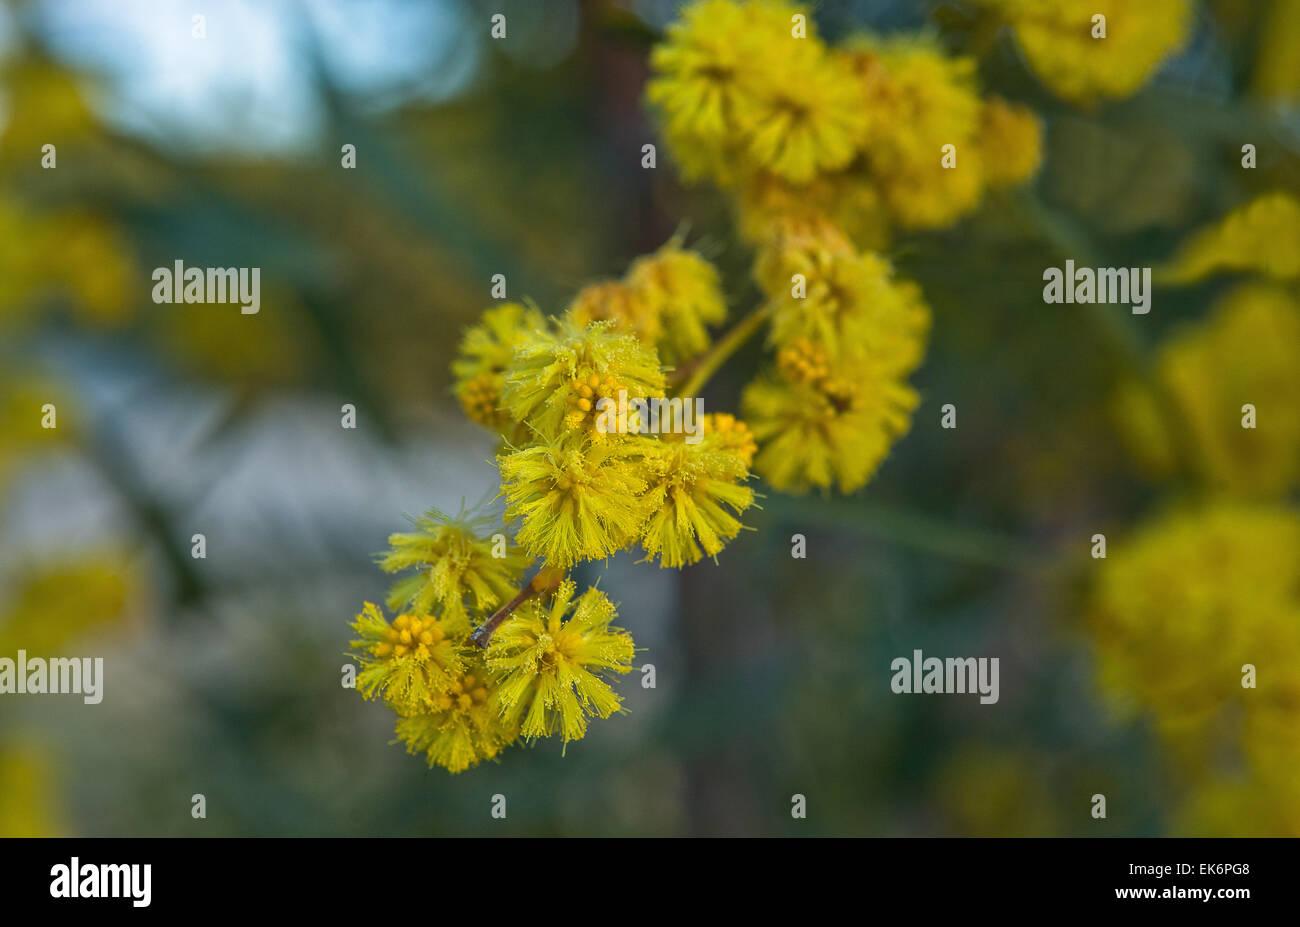 Acacia Pycnantha Golden Wattle Is Australias Floral Emblem It Is